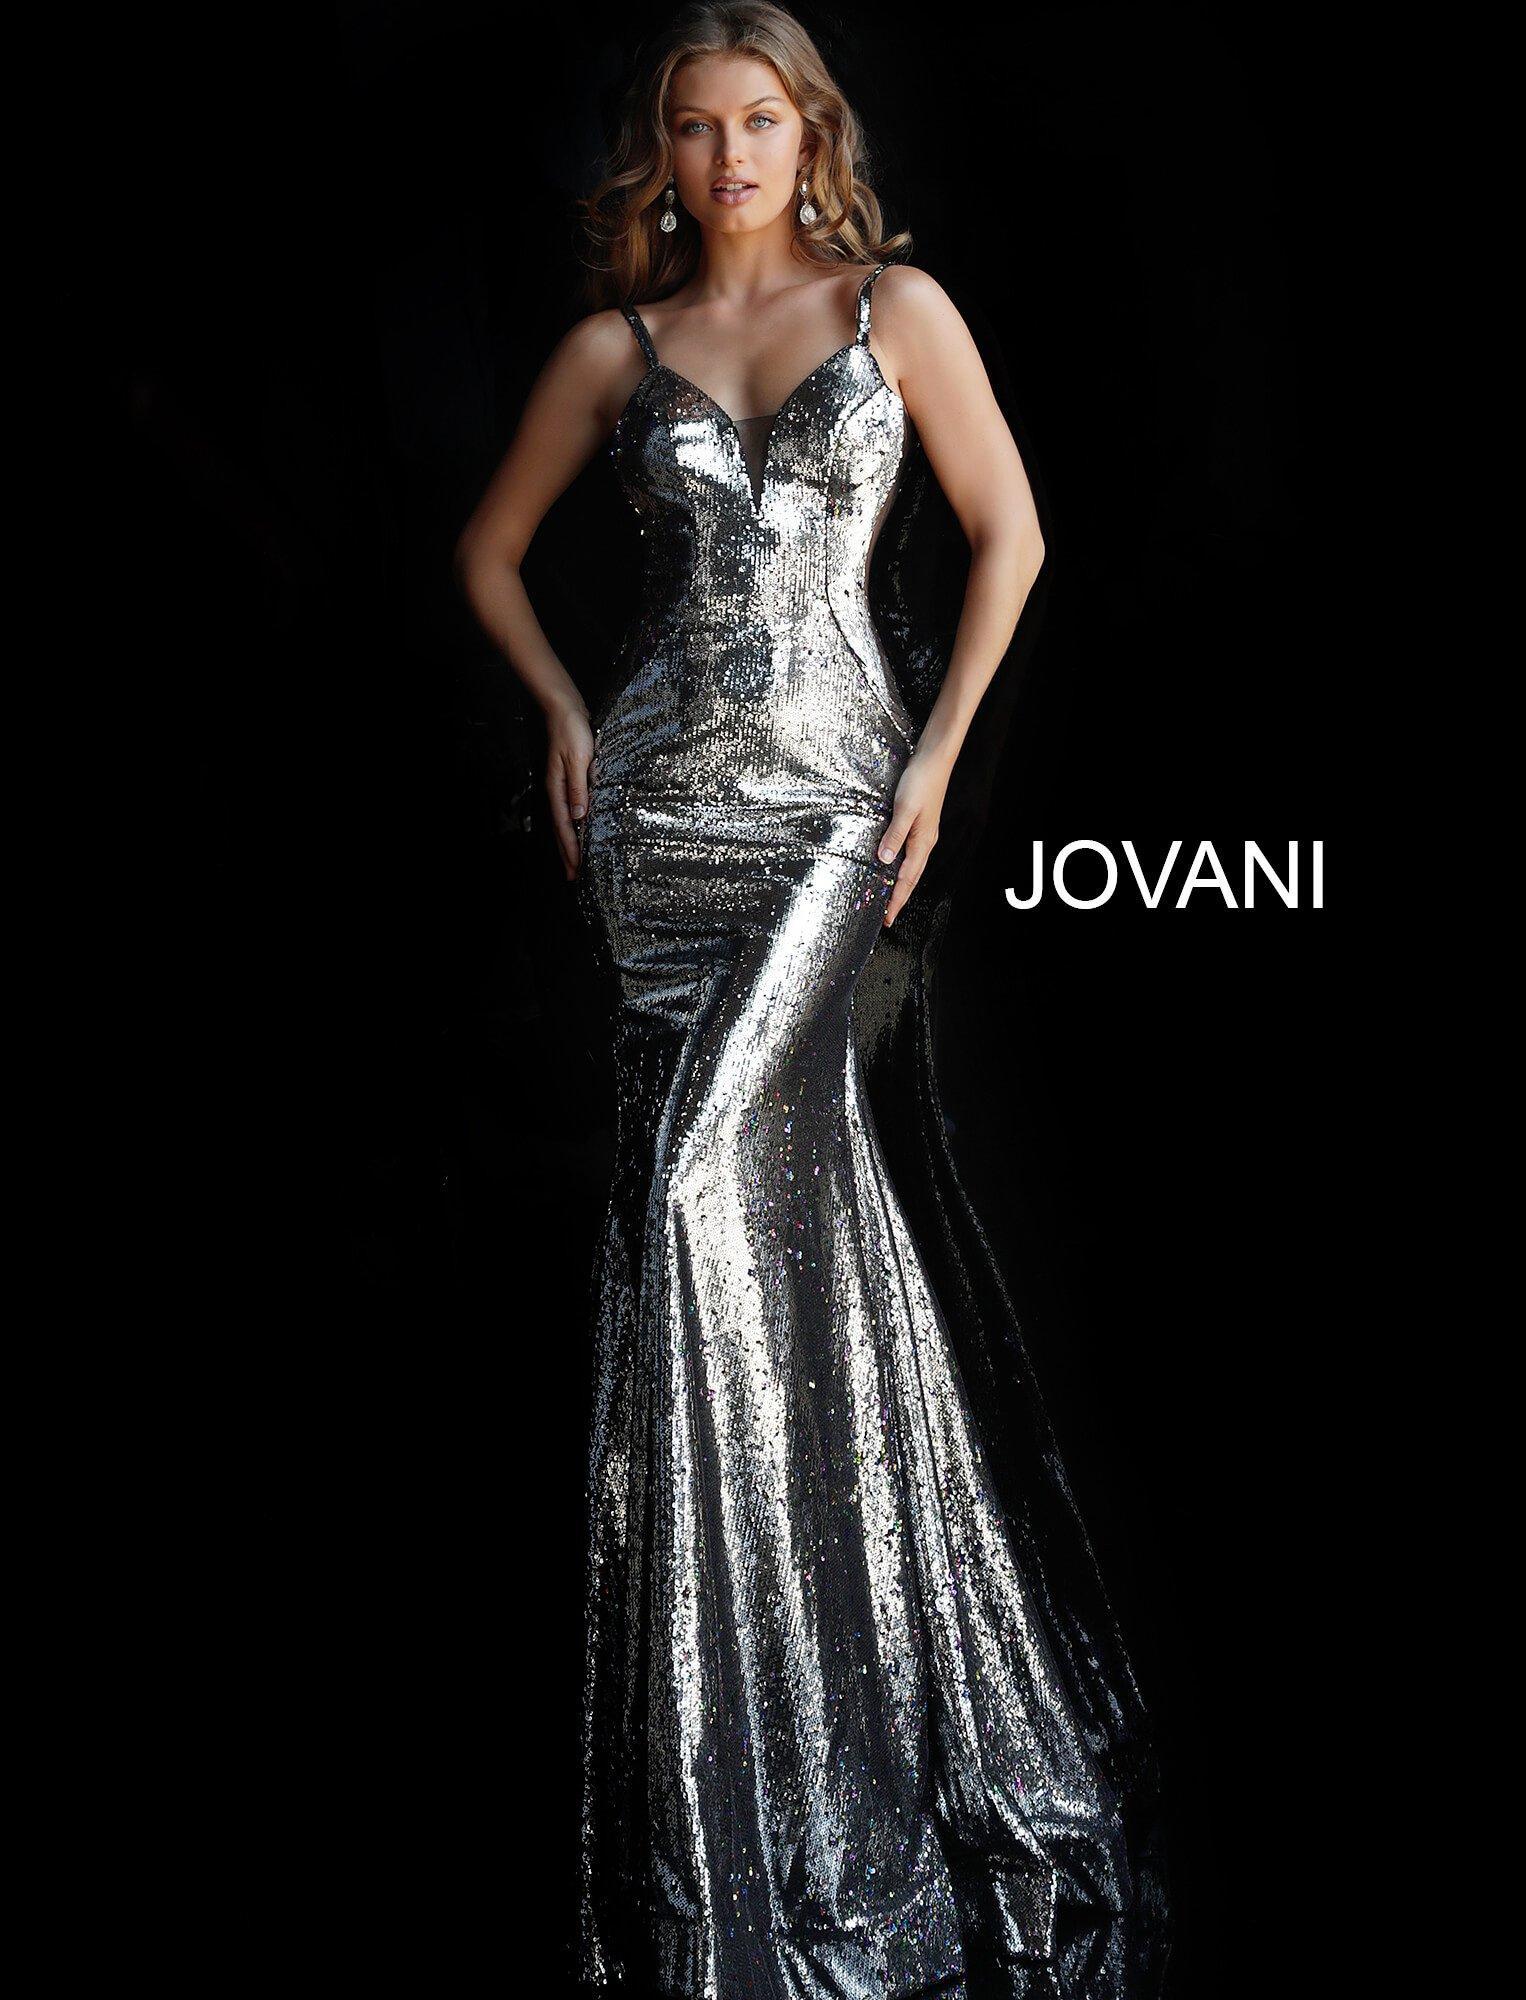 d9899fa3ab6 Lyst - Jovani 61398 Sequined Deep V-neck Long Trumpet Dress in Black